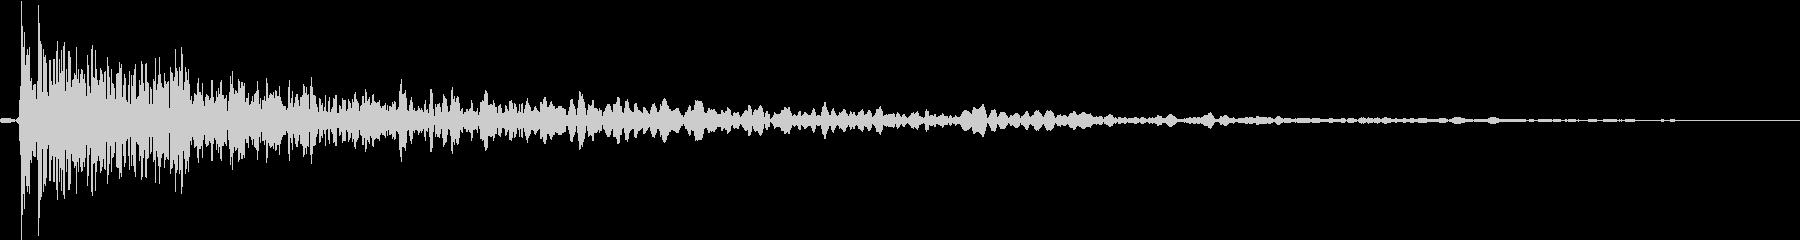 Gangu (Sound to beat a slimy iron plate)'s unreproduced waveform